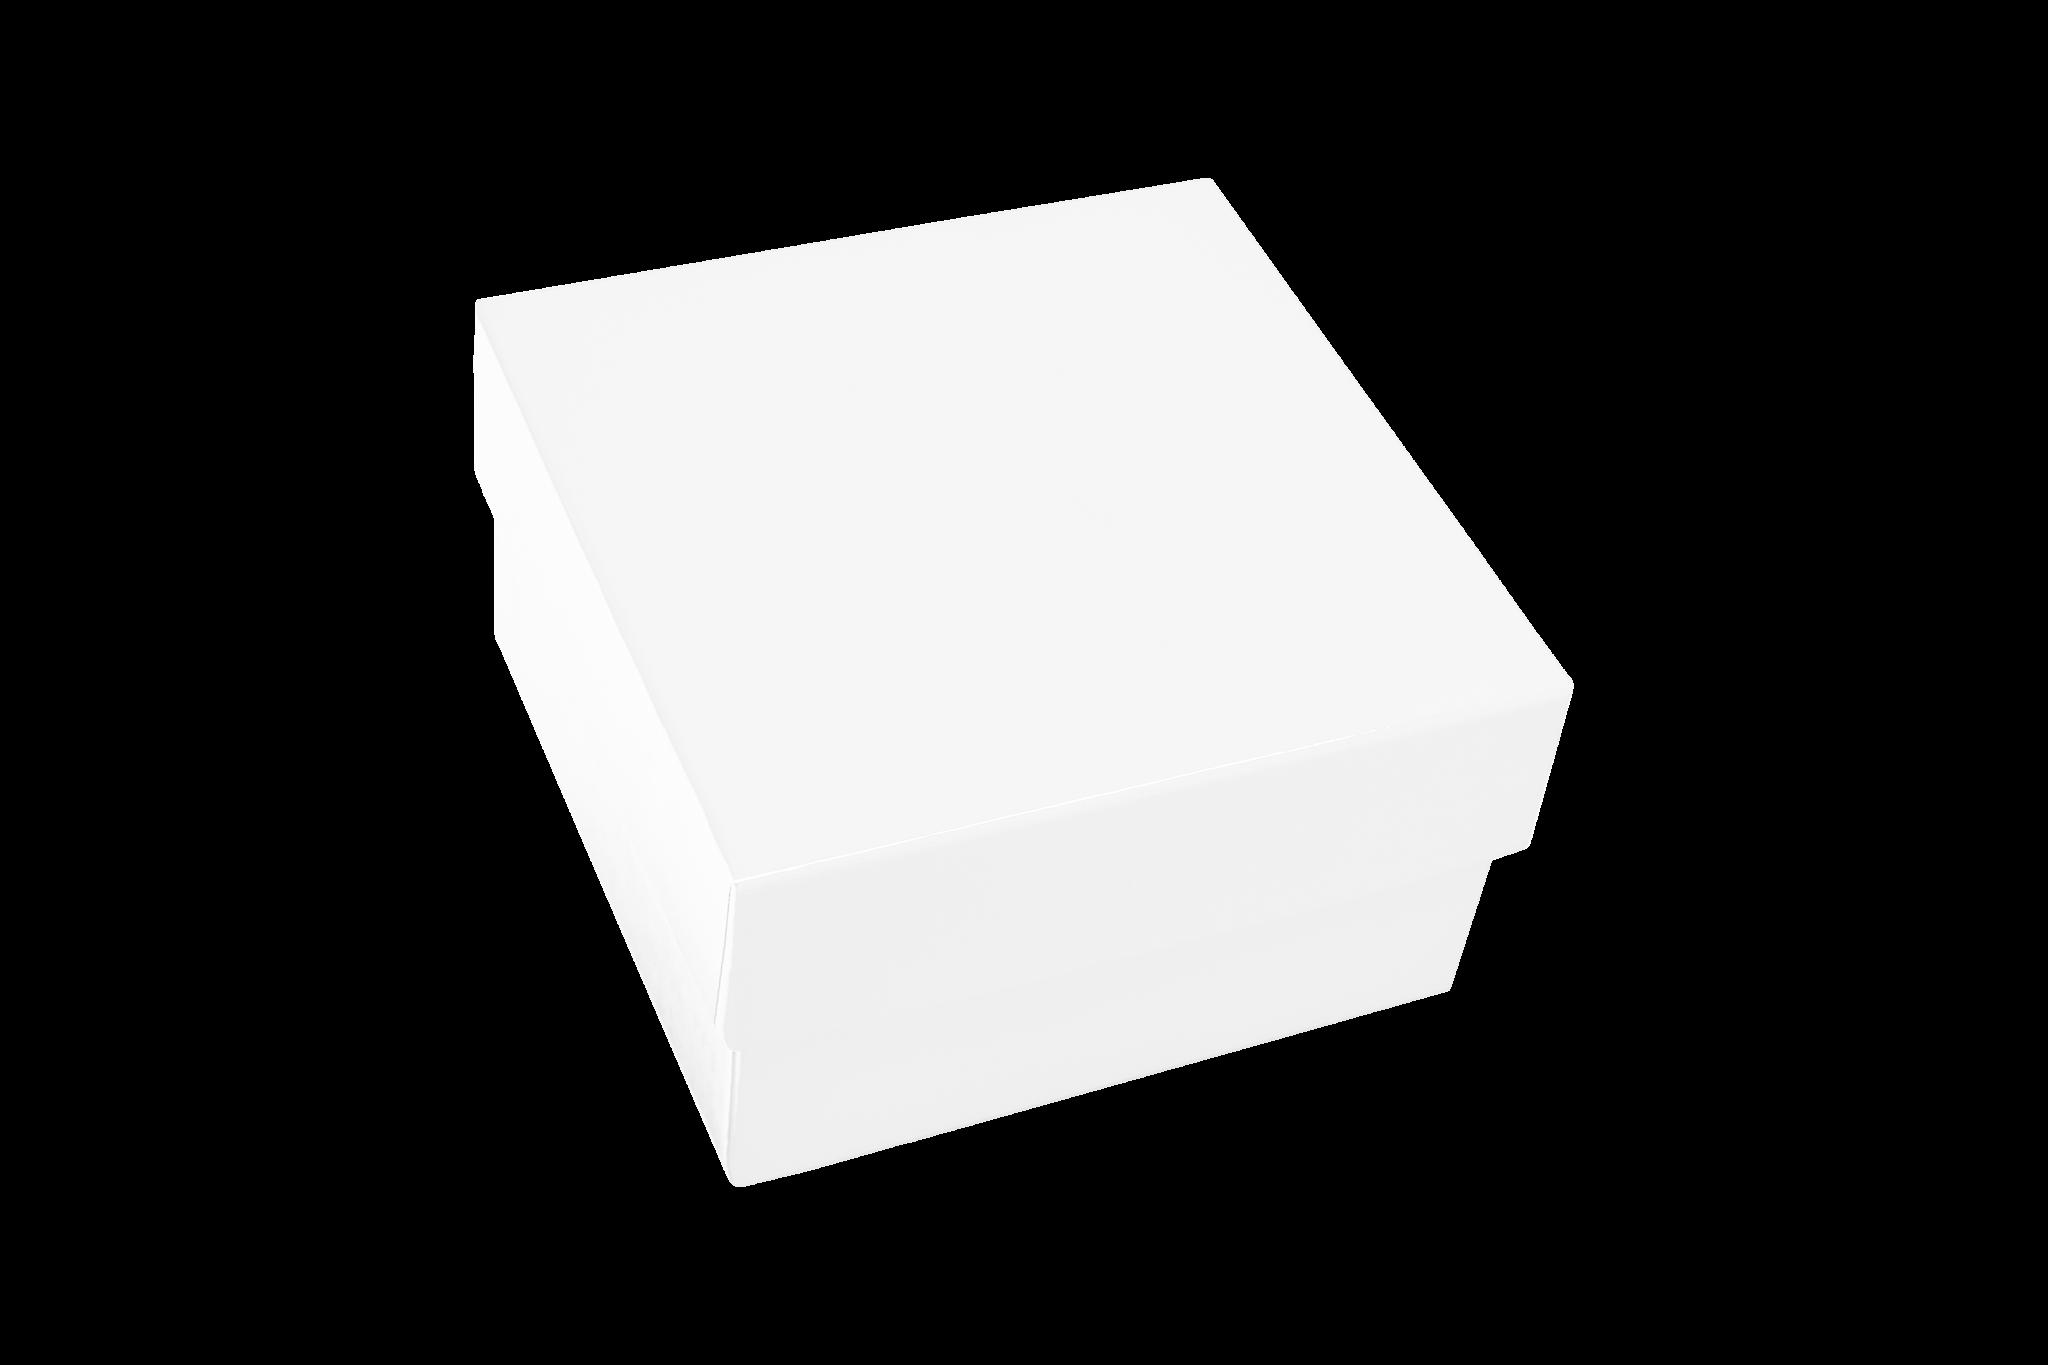 cryovial storage box, cryovial storage boxes, cryovial box, cryovial boxes, cryovial rack, cryovial racks